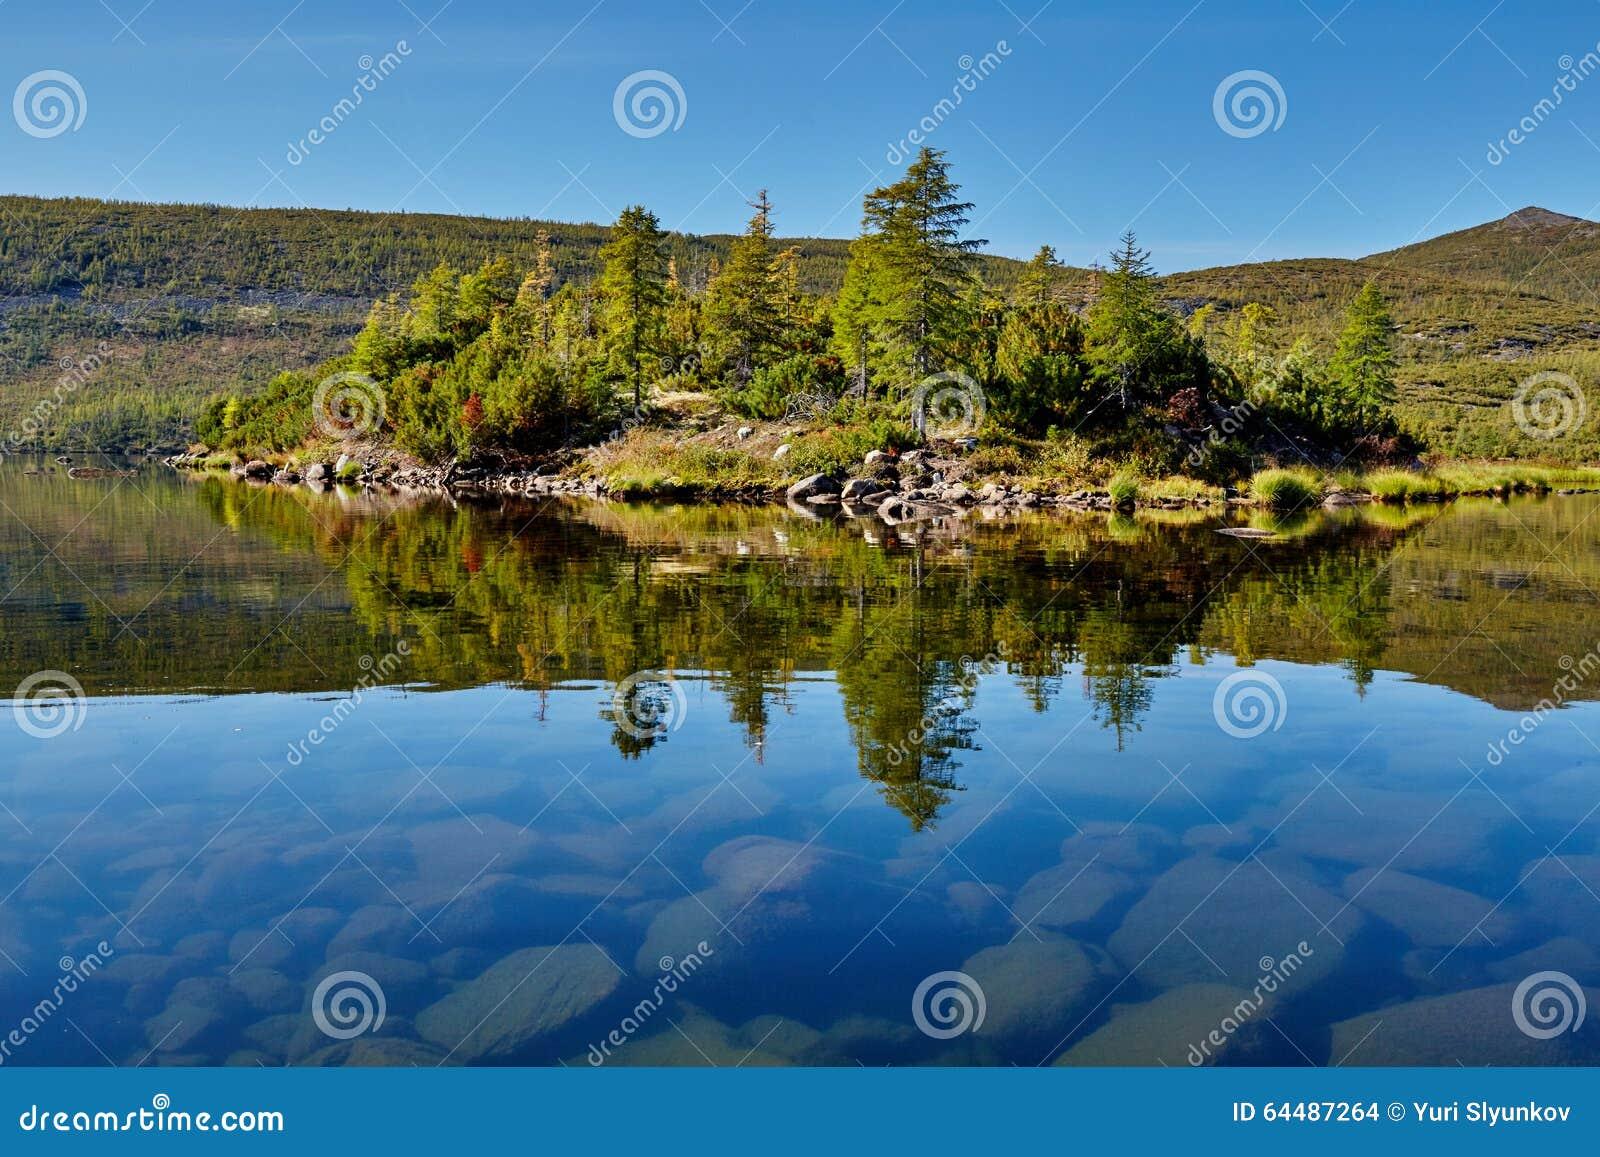 Island. Jack Londons lake. Kolyma